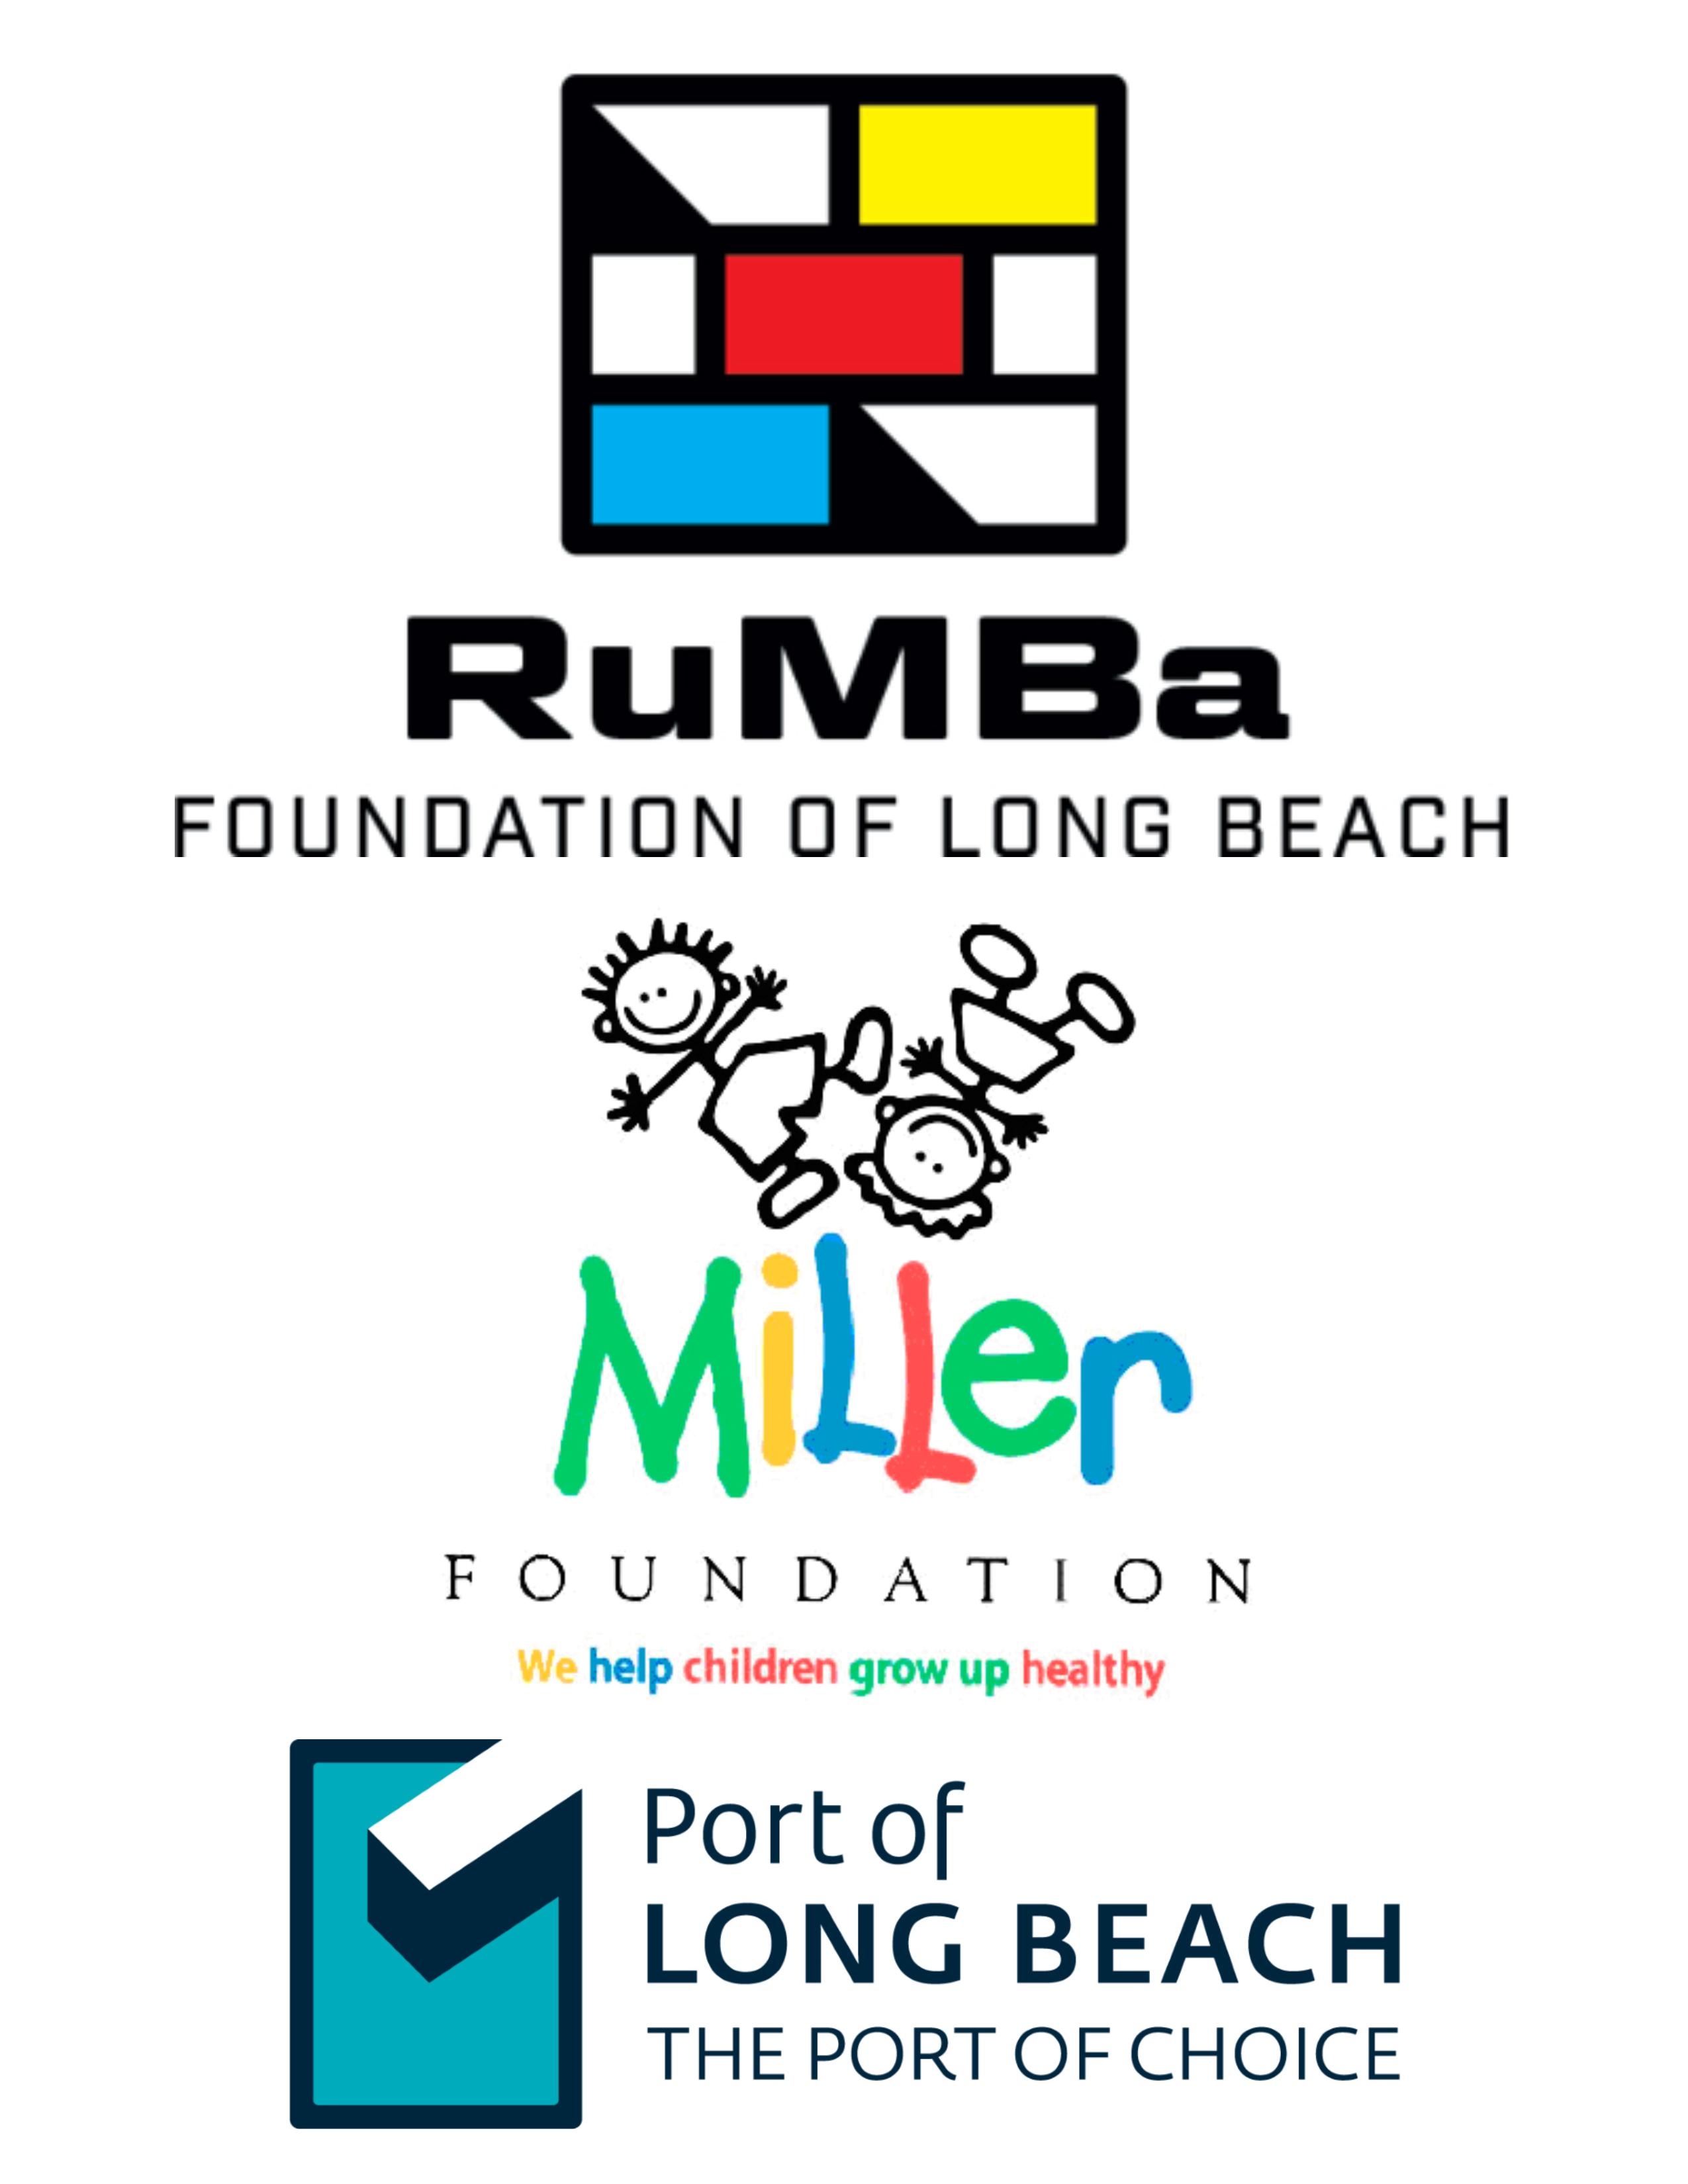 Logos for RuMBa Foundation of Long Beach, Miller Foundation and the Port of Long beach